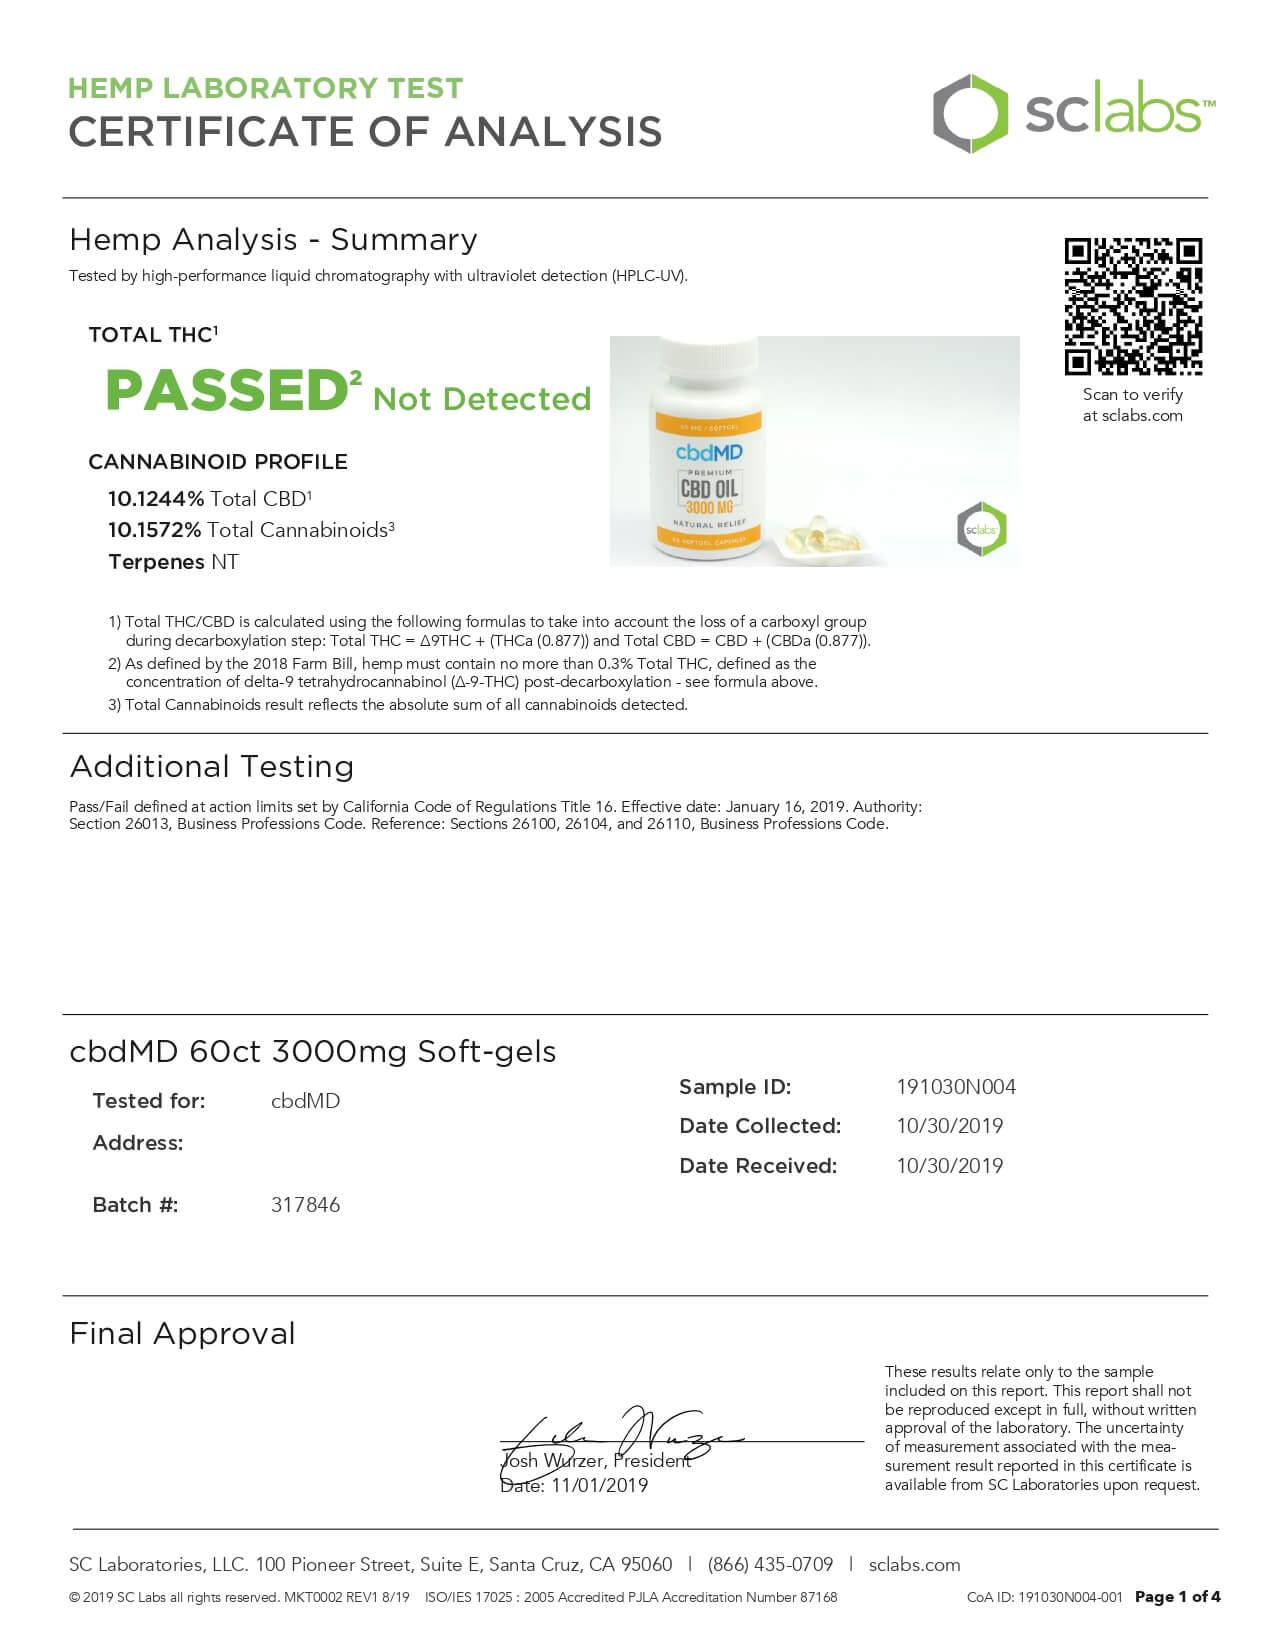 cbdMD CBD Softgels Cbd Oil Softgel Capsules 60ct 3000mg Lab Report